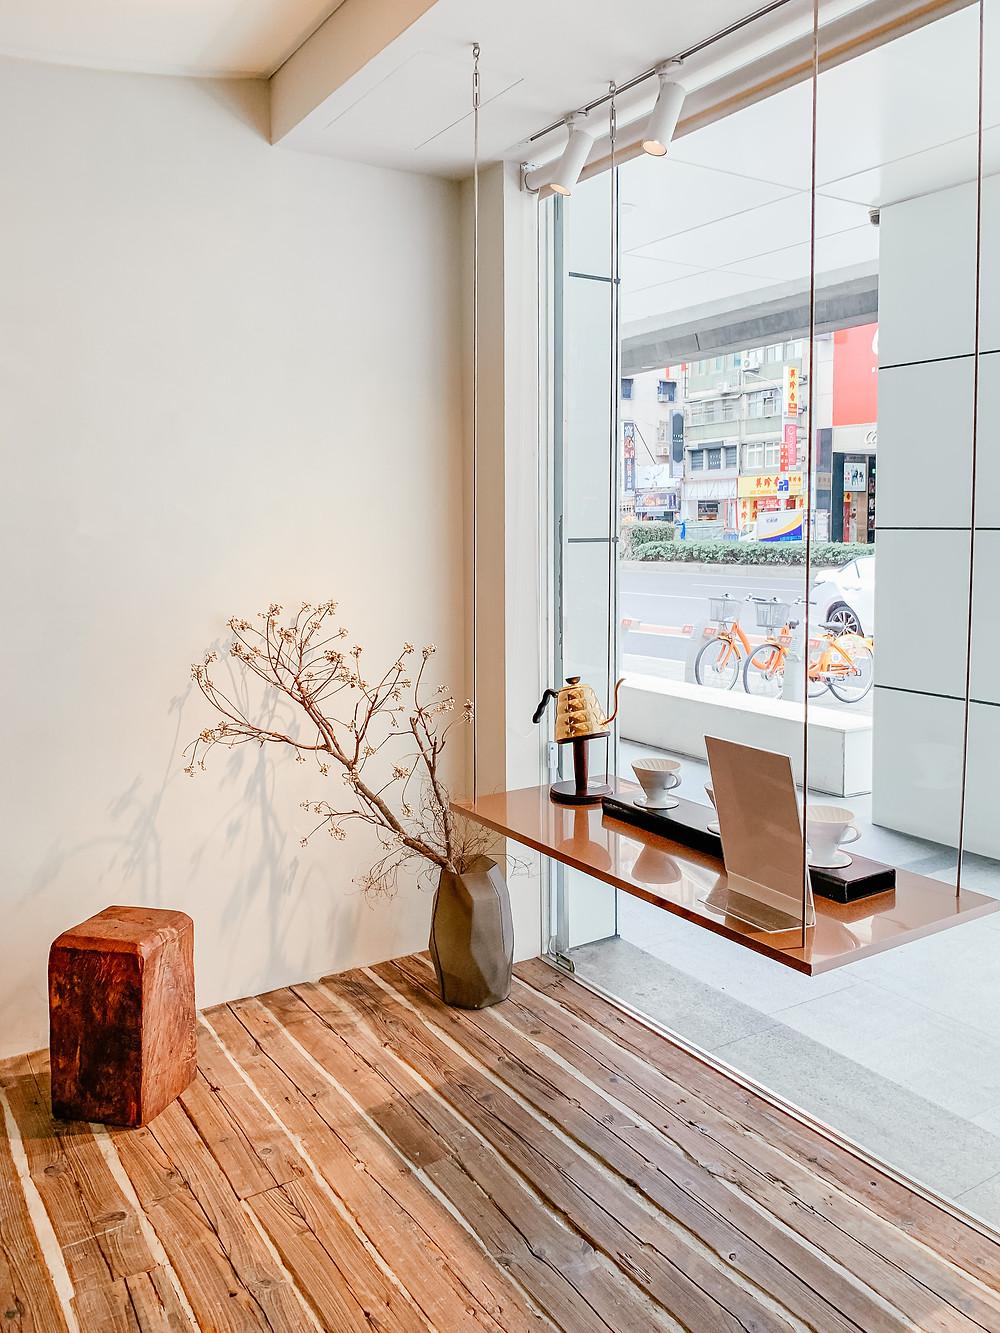 VWI by ChadWang | Taipei Cafe |  A Style Alike